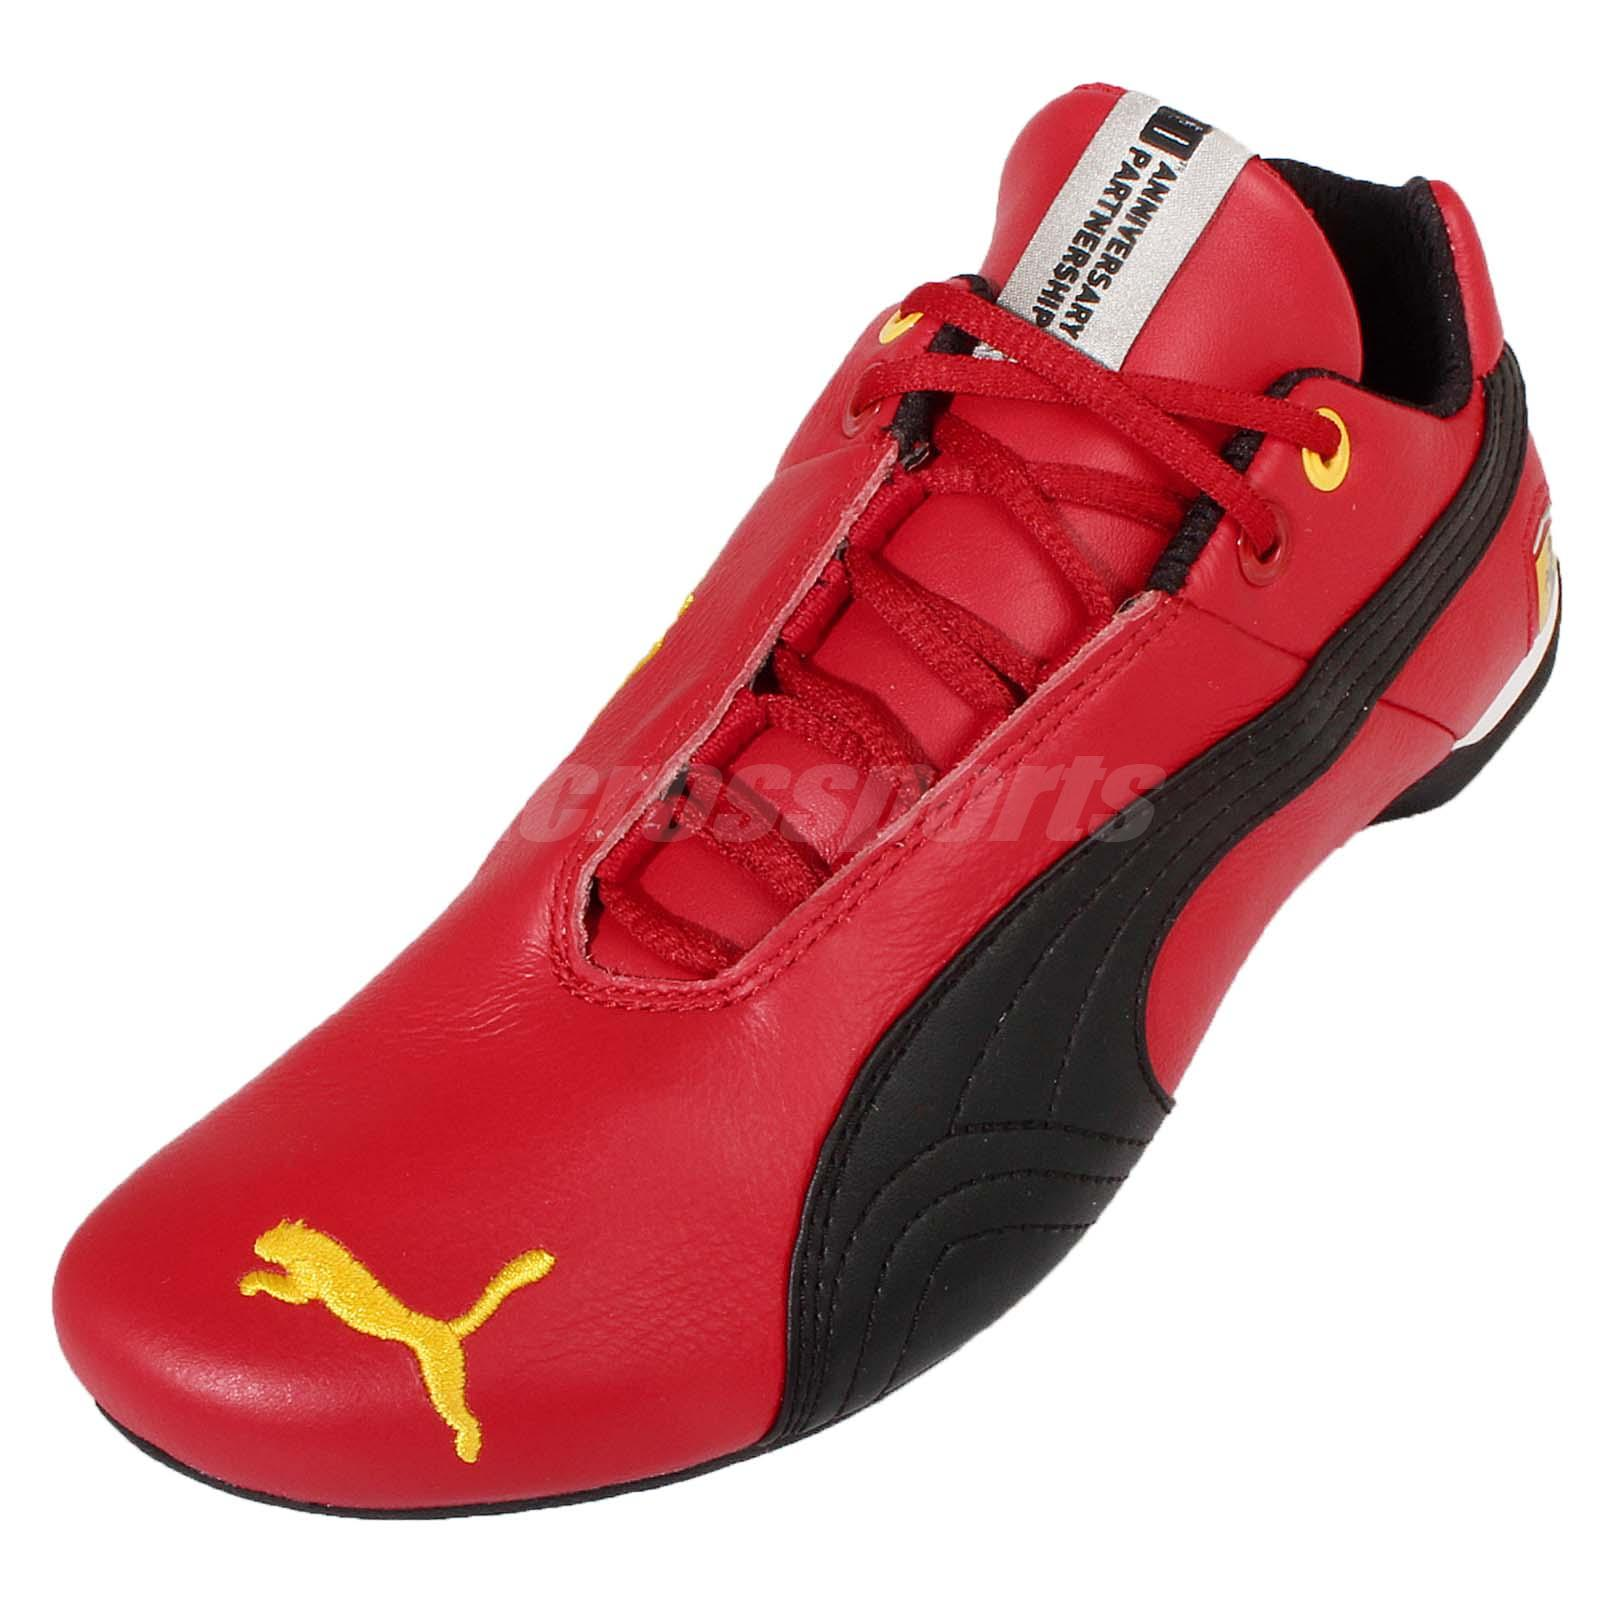 ferrari mens shoes on sale   OFF35% Discounts ea51e1105